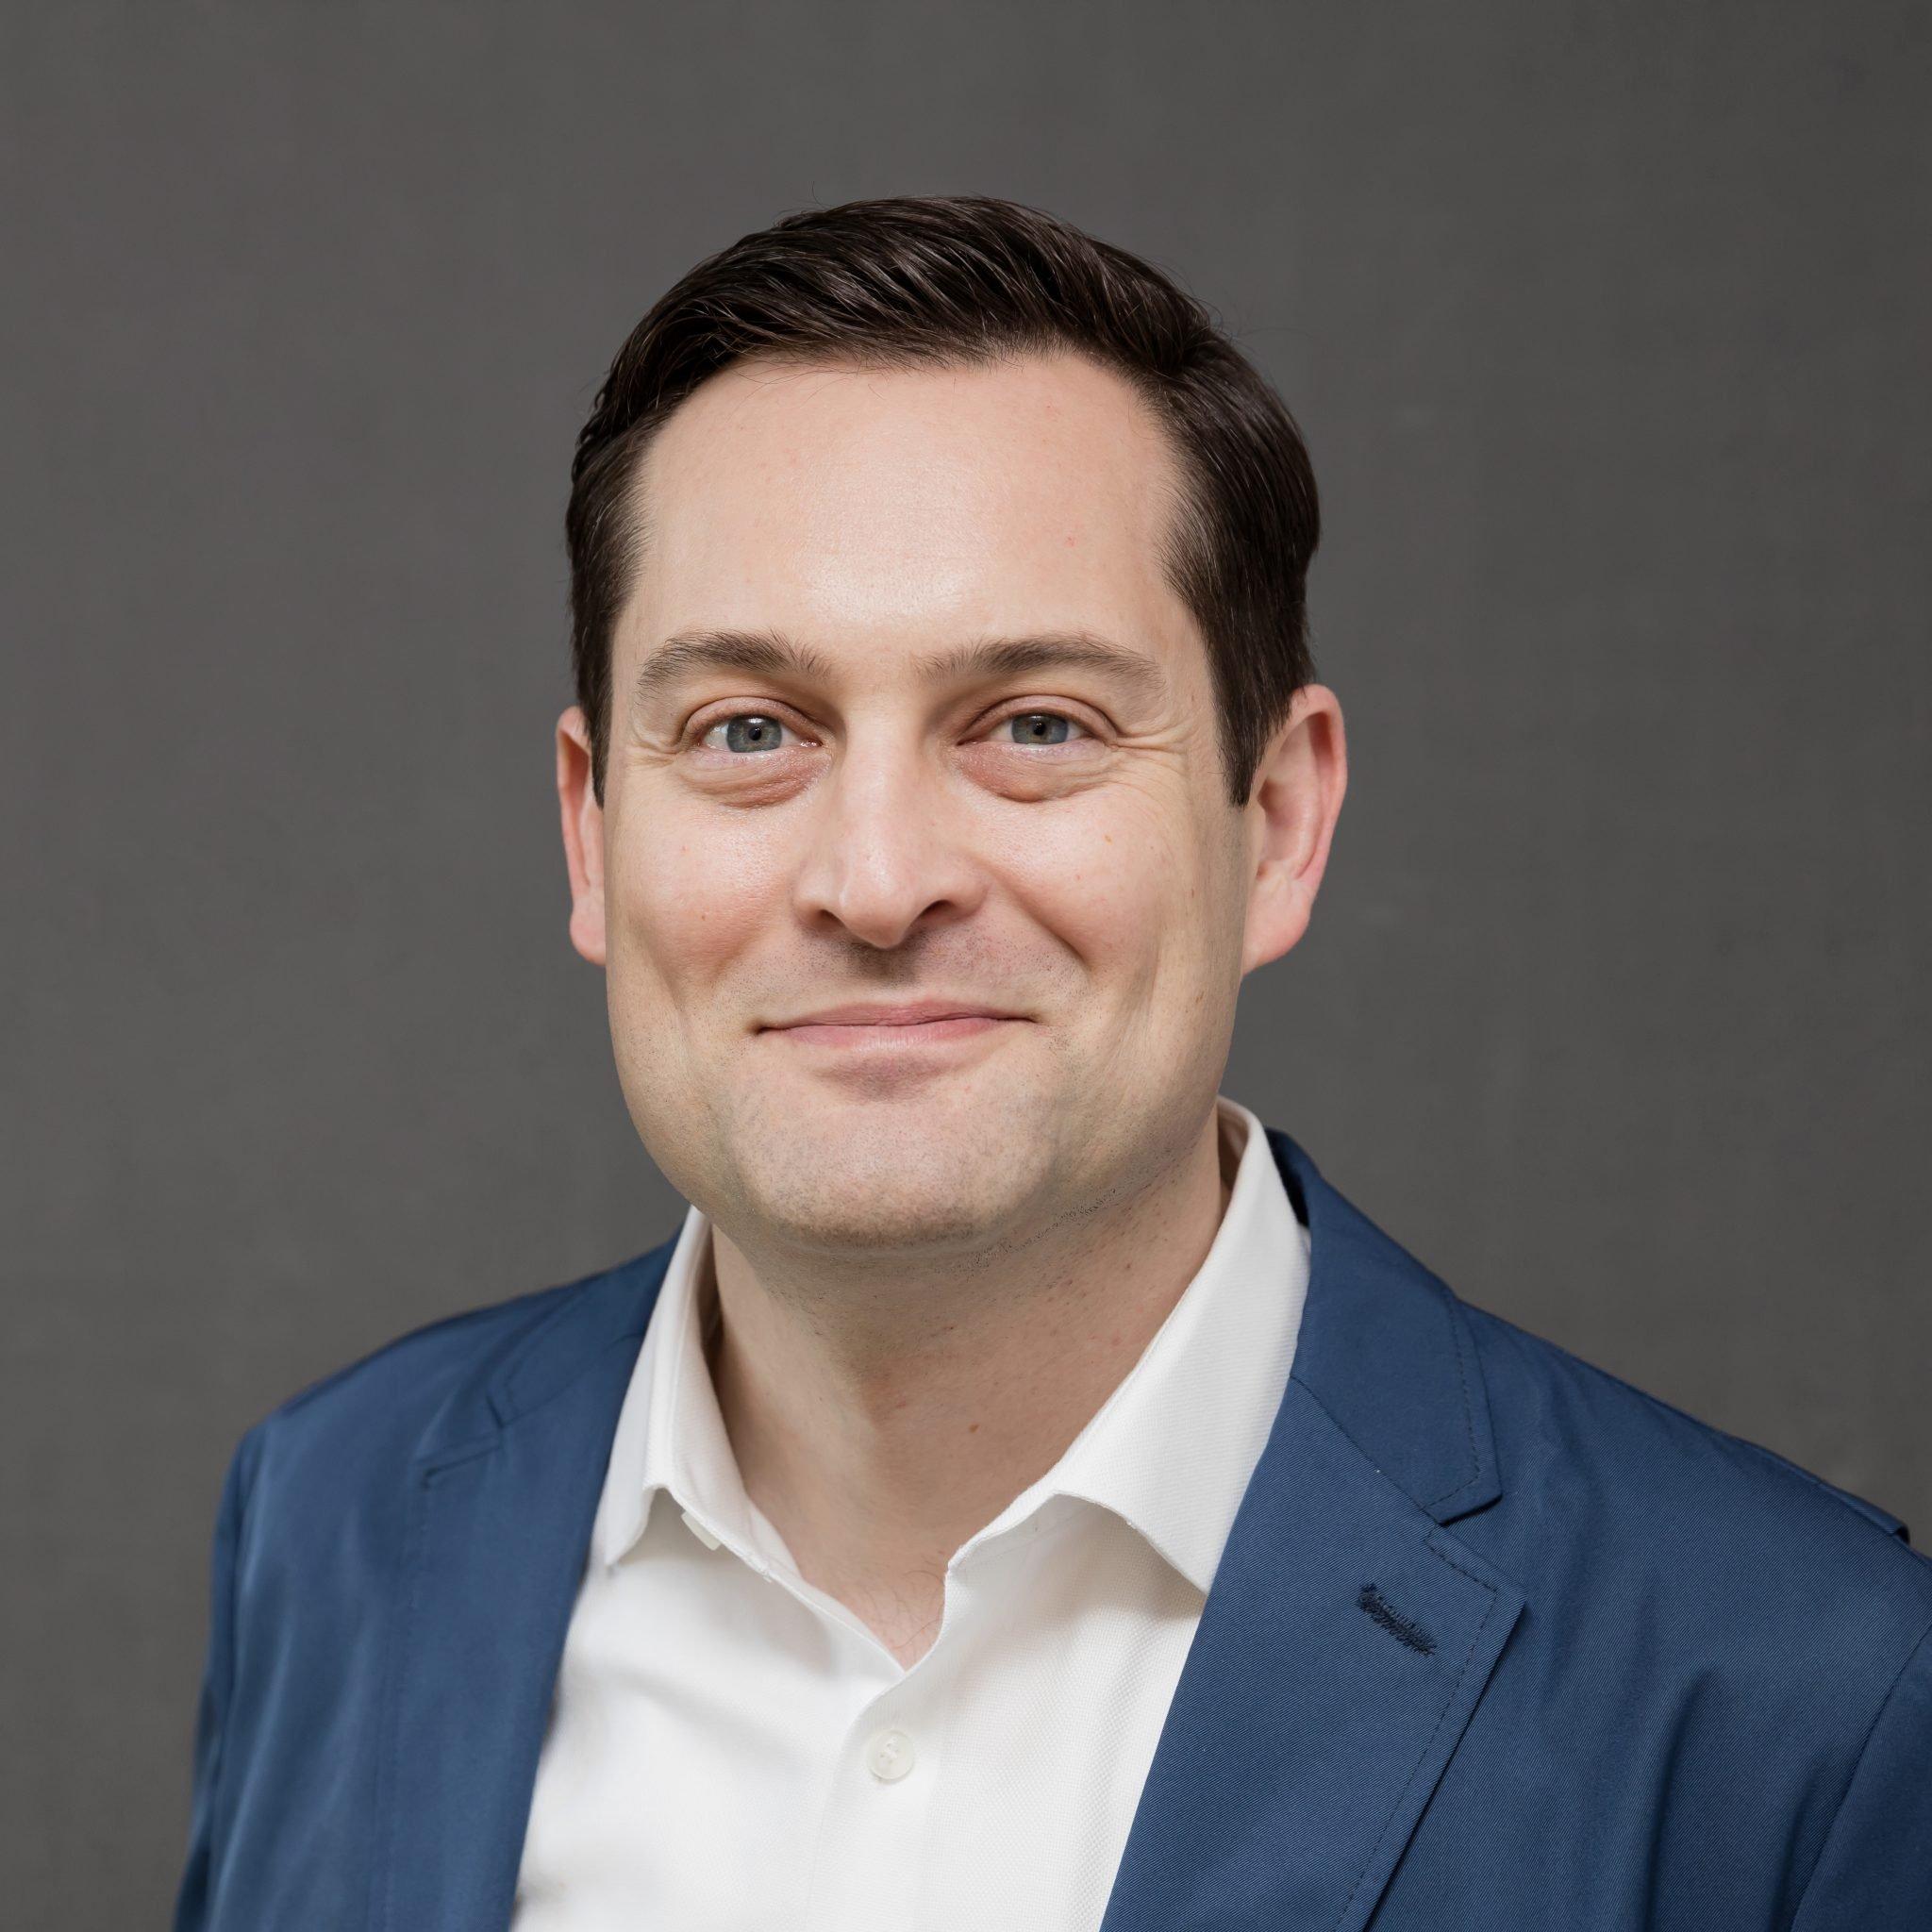 Joel Efrussy, AIA Headshot